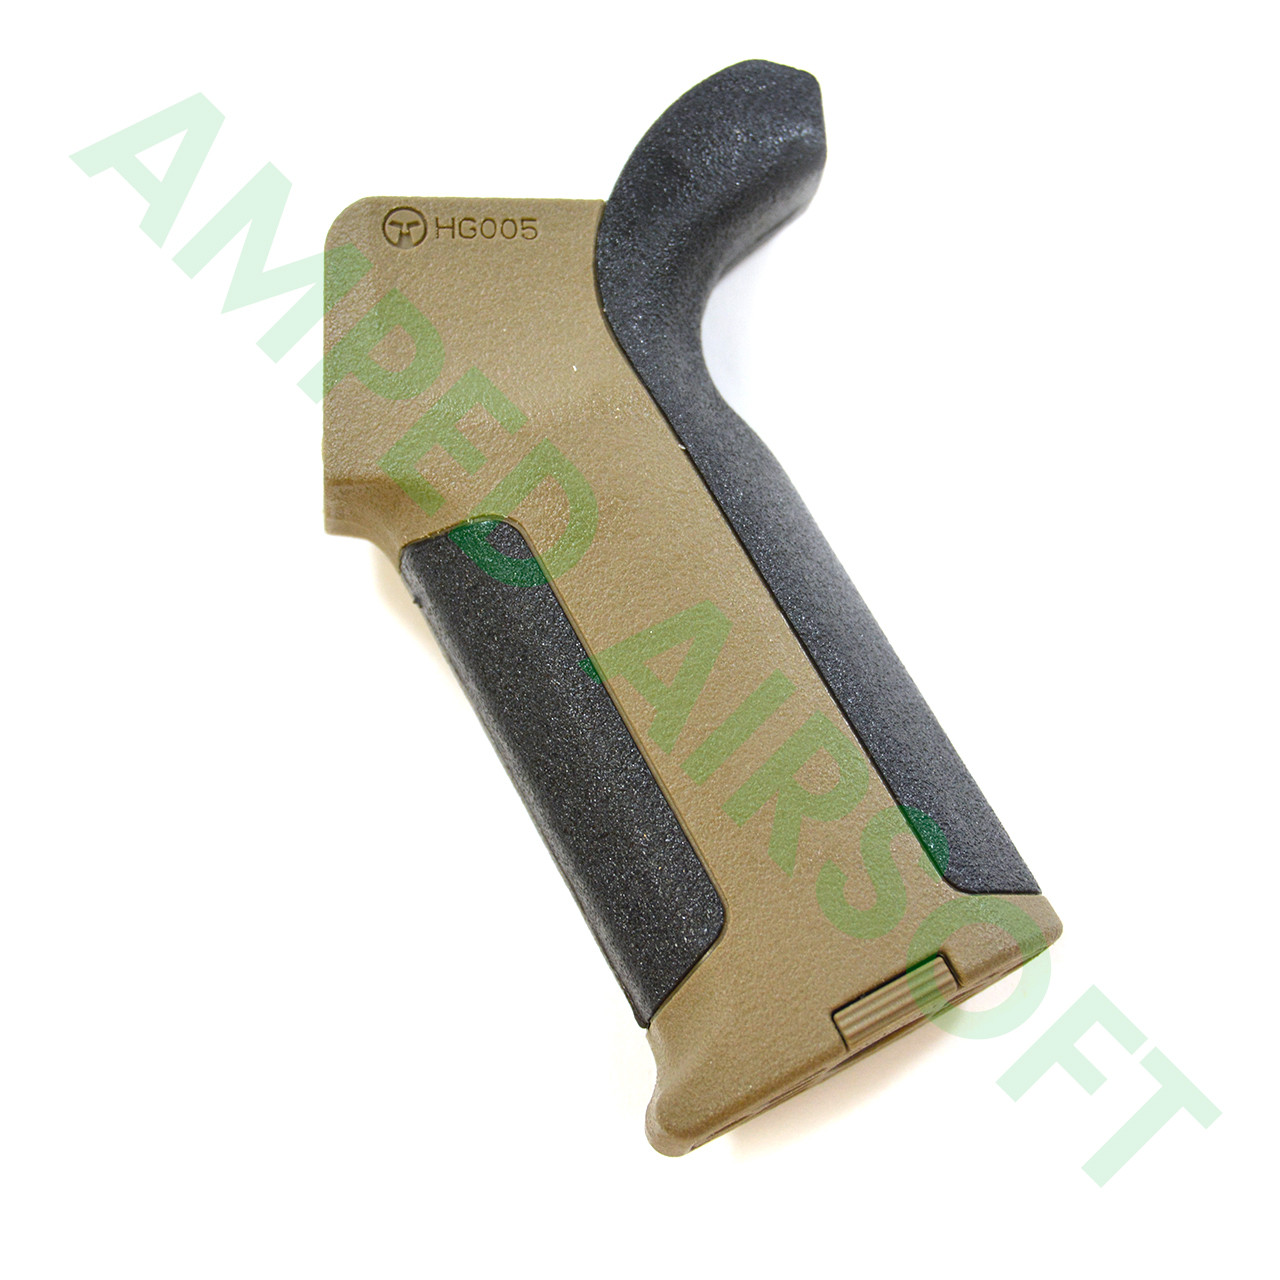 Amoeba - Pro Beavertail Backstrap M4 Grip (Black/Dark Earth) Left Side